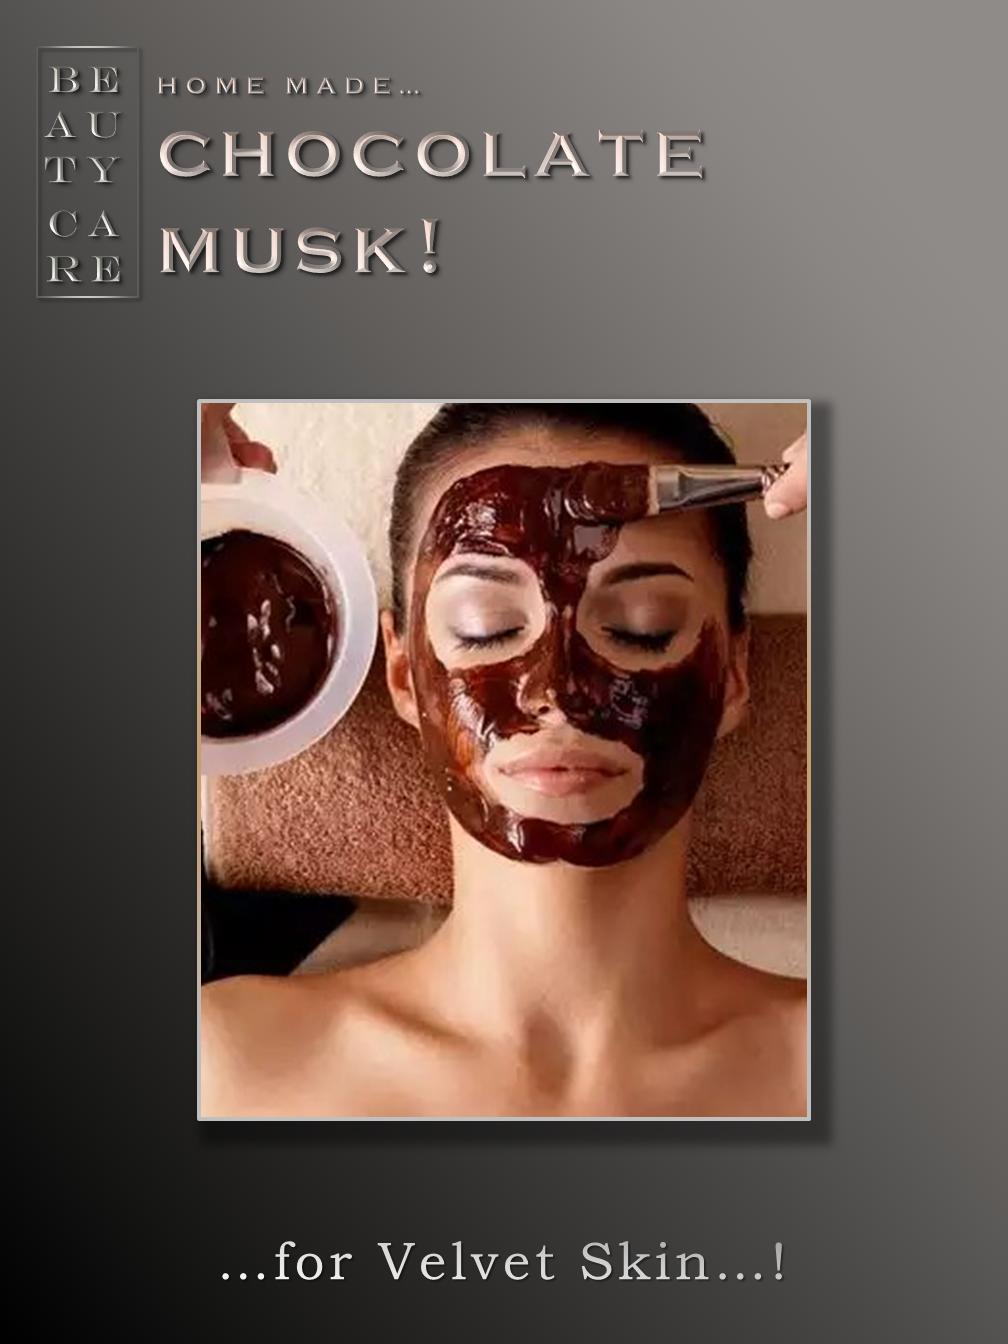 Chocolate Musk!